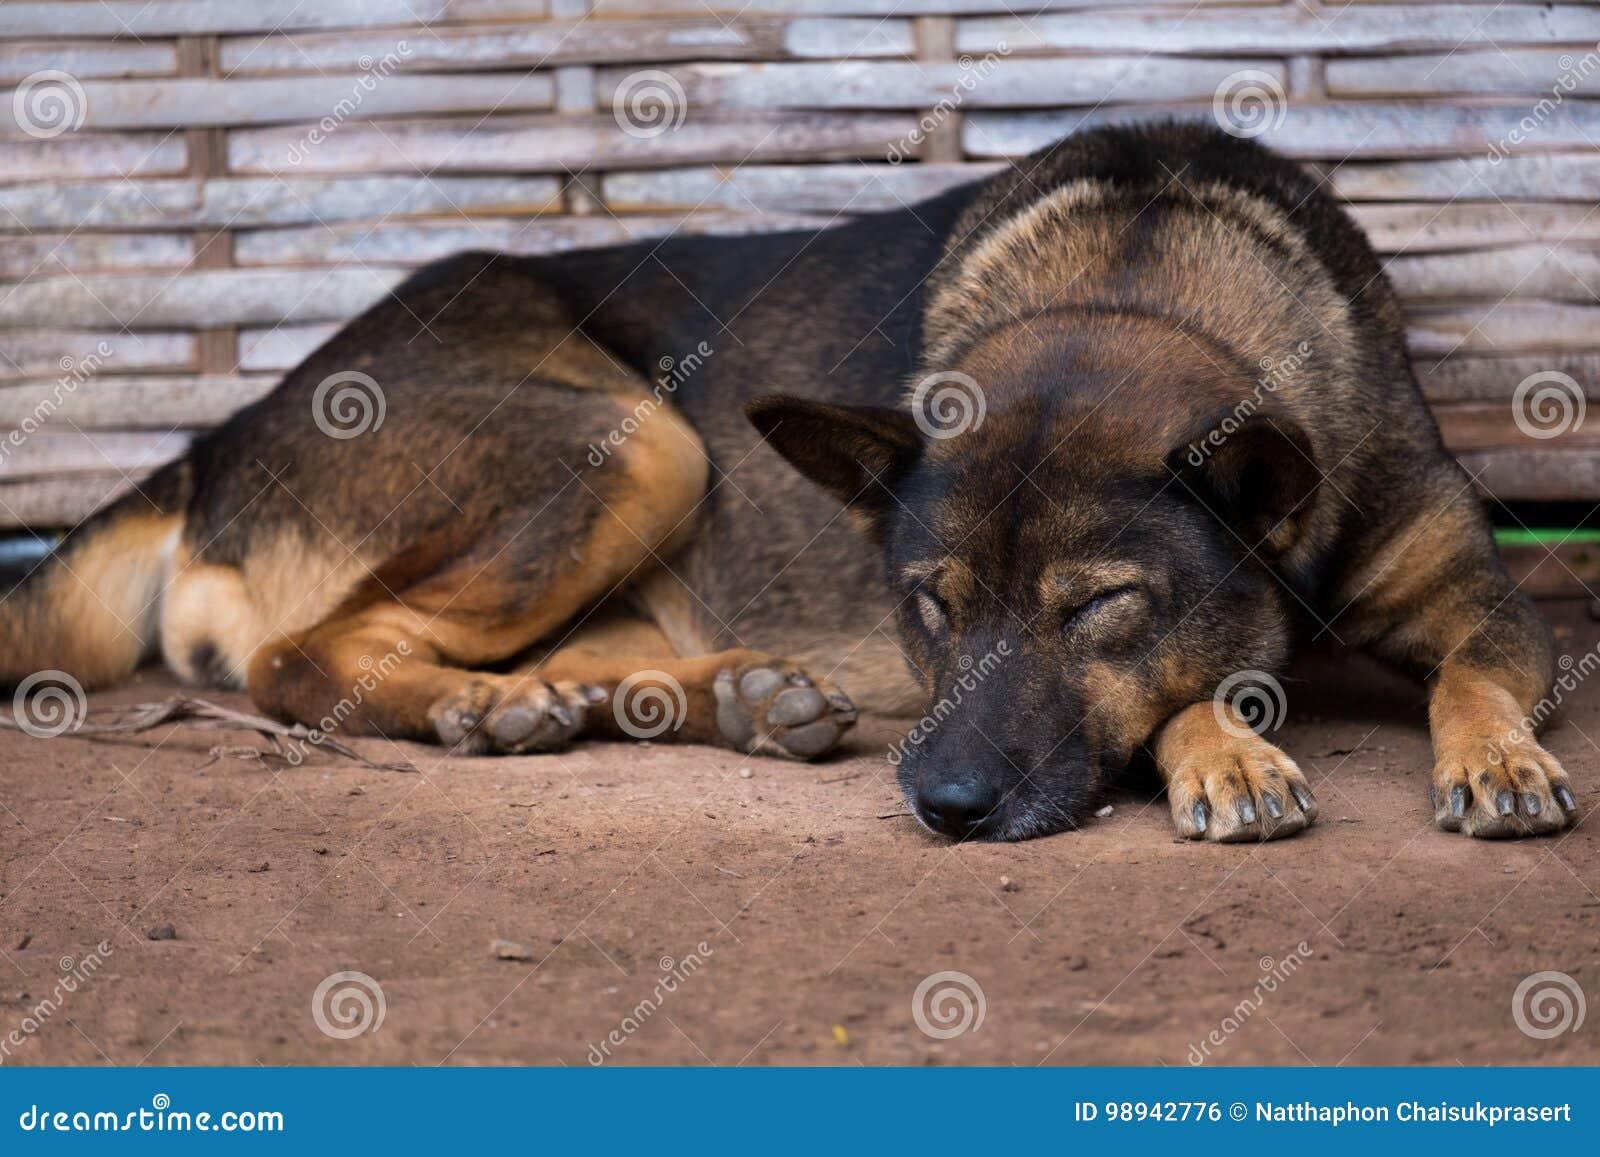 Sypialny pies lied na piasku